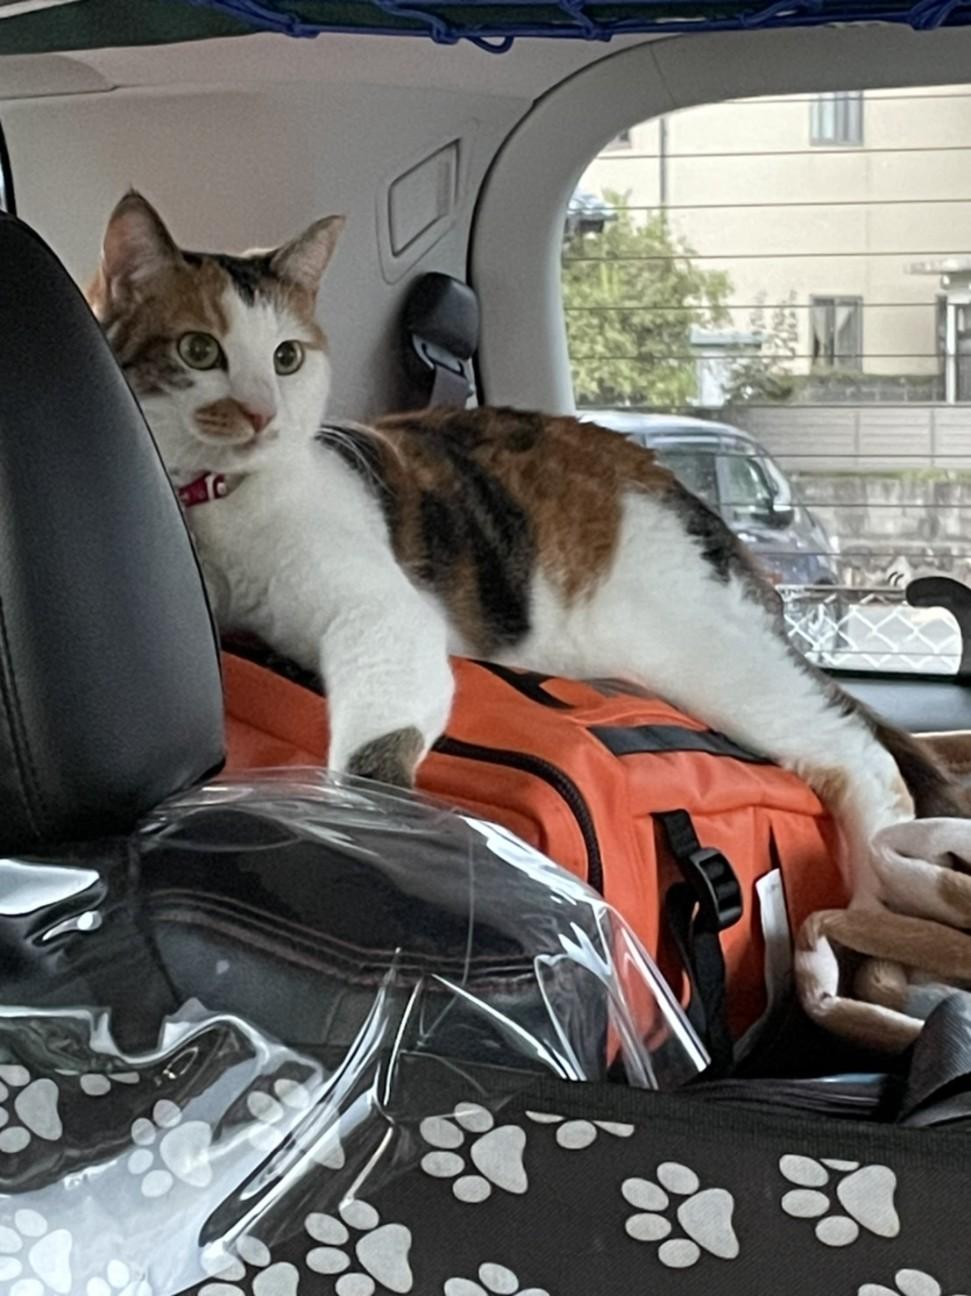 f:id:Three_Traveling_Cats:20210715205853j:image